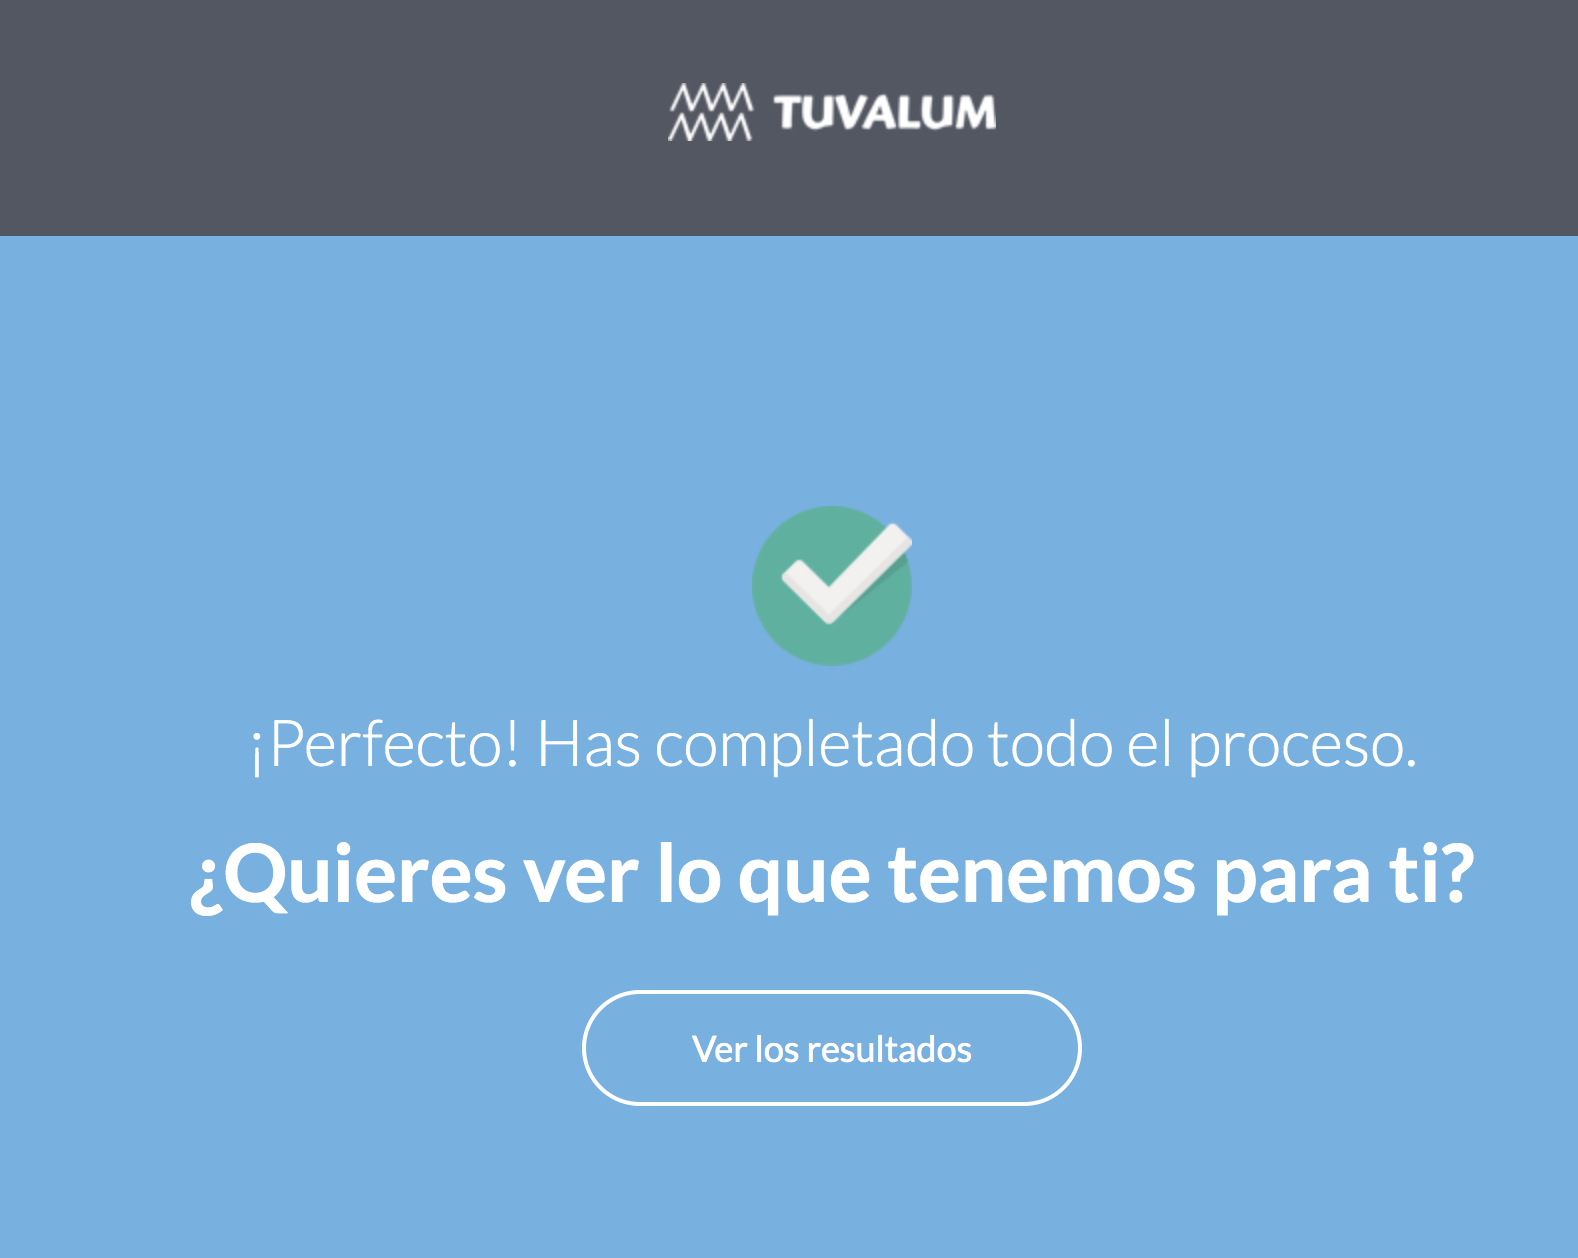 Turvalum recomendador pantalla final JoanSegduior